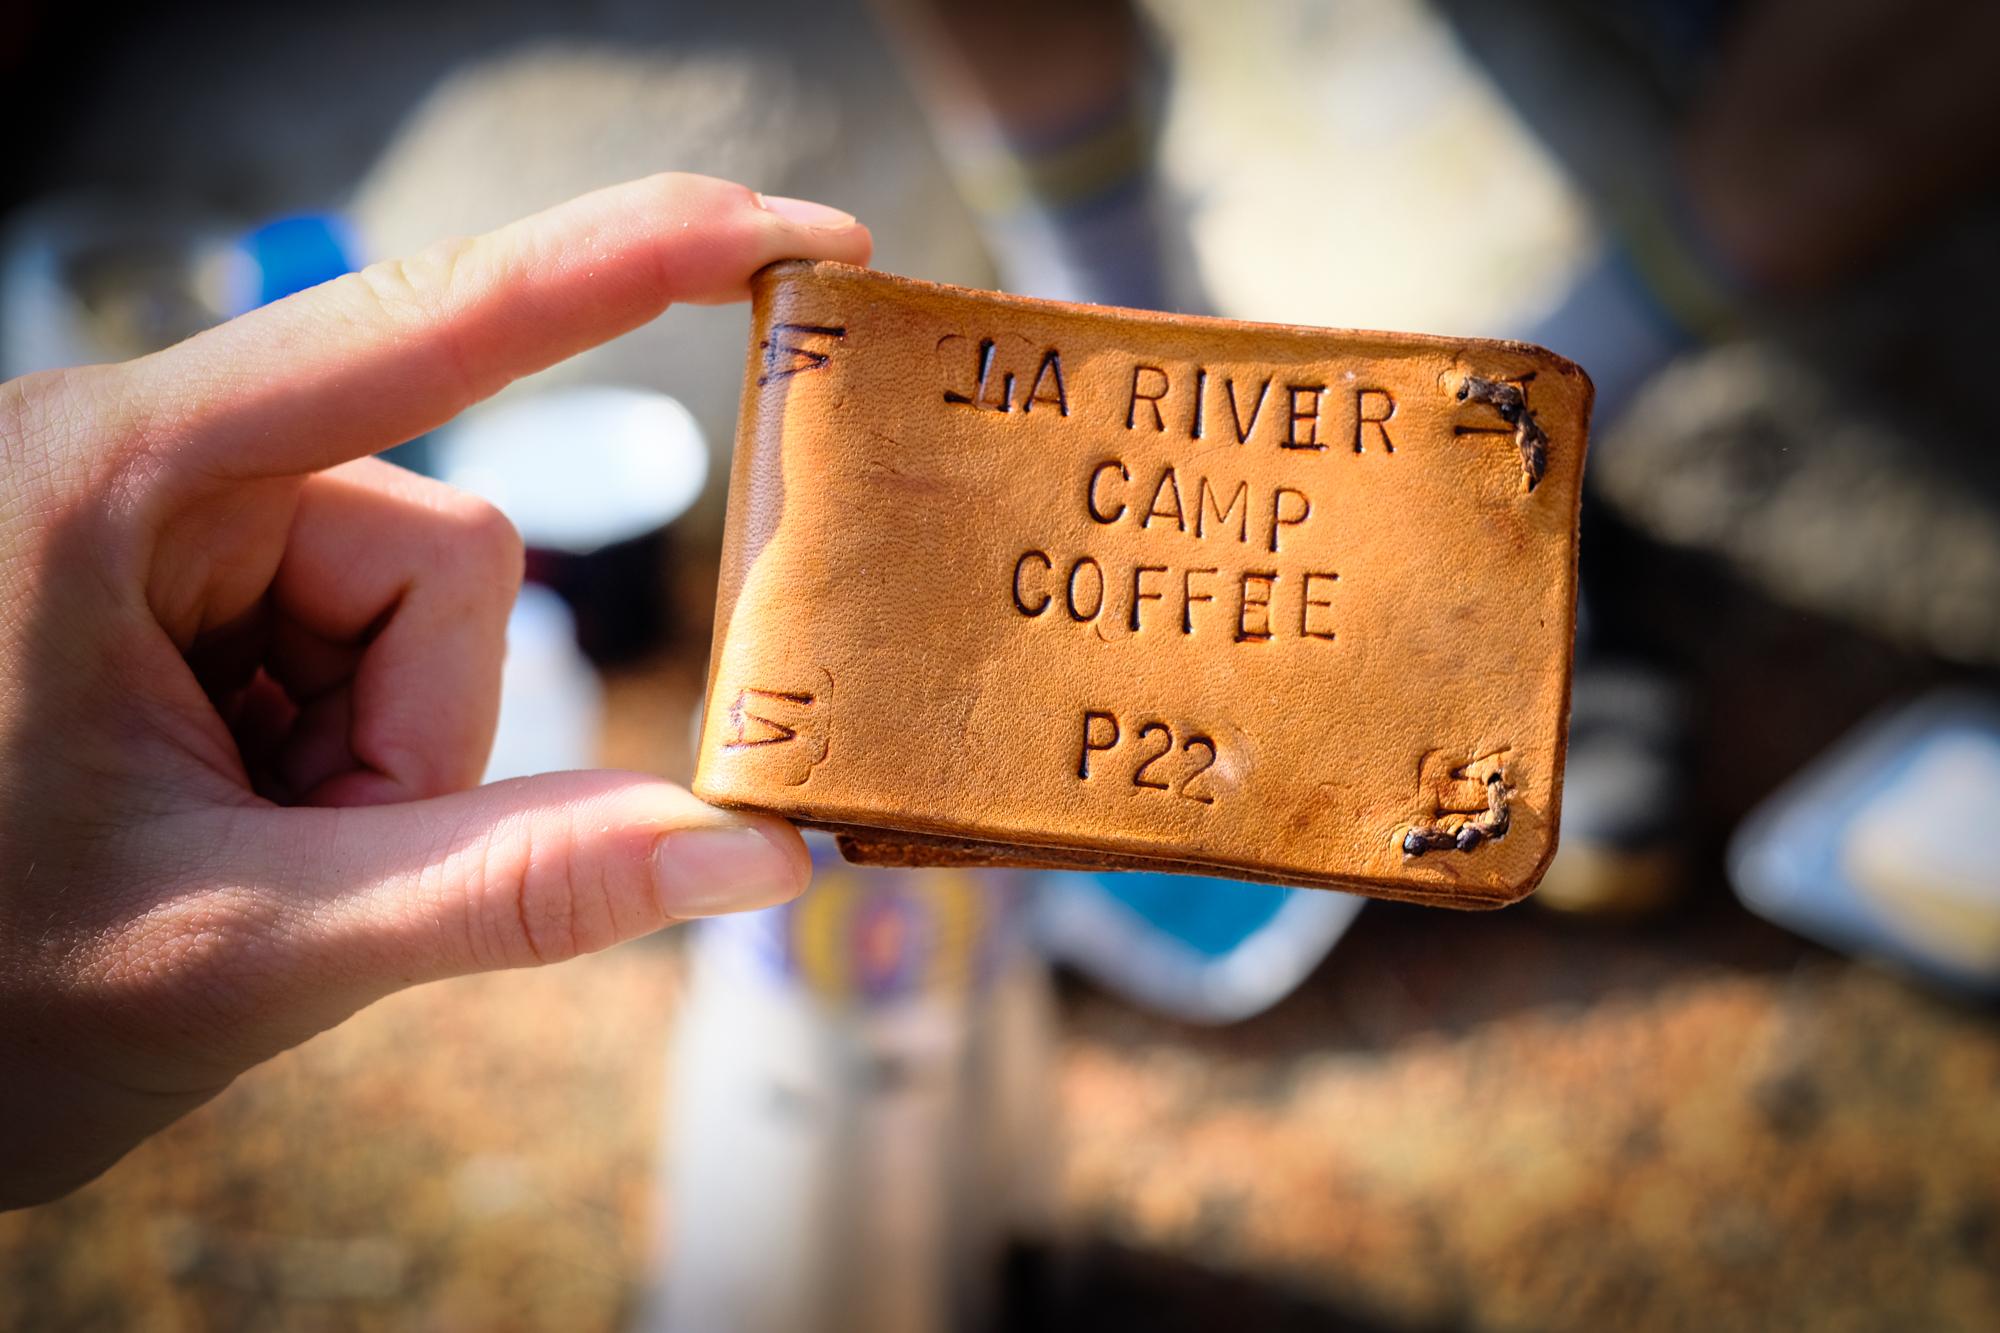 LA River Camp Coffee-24.jpg